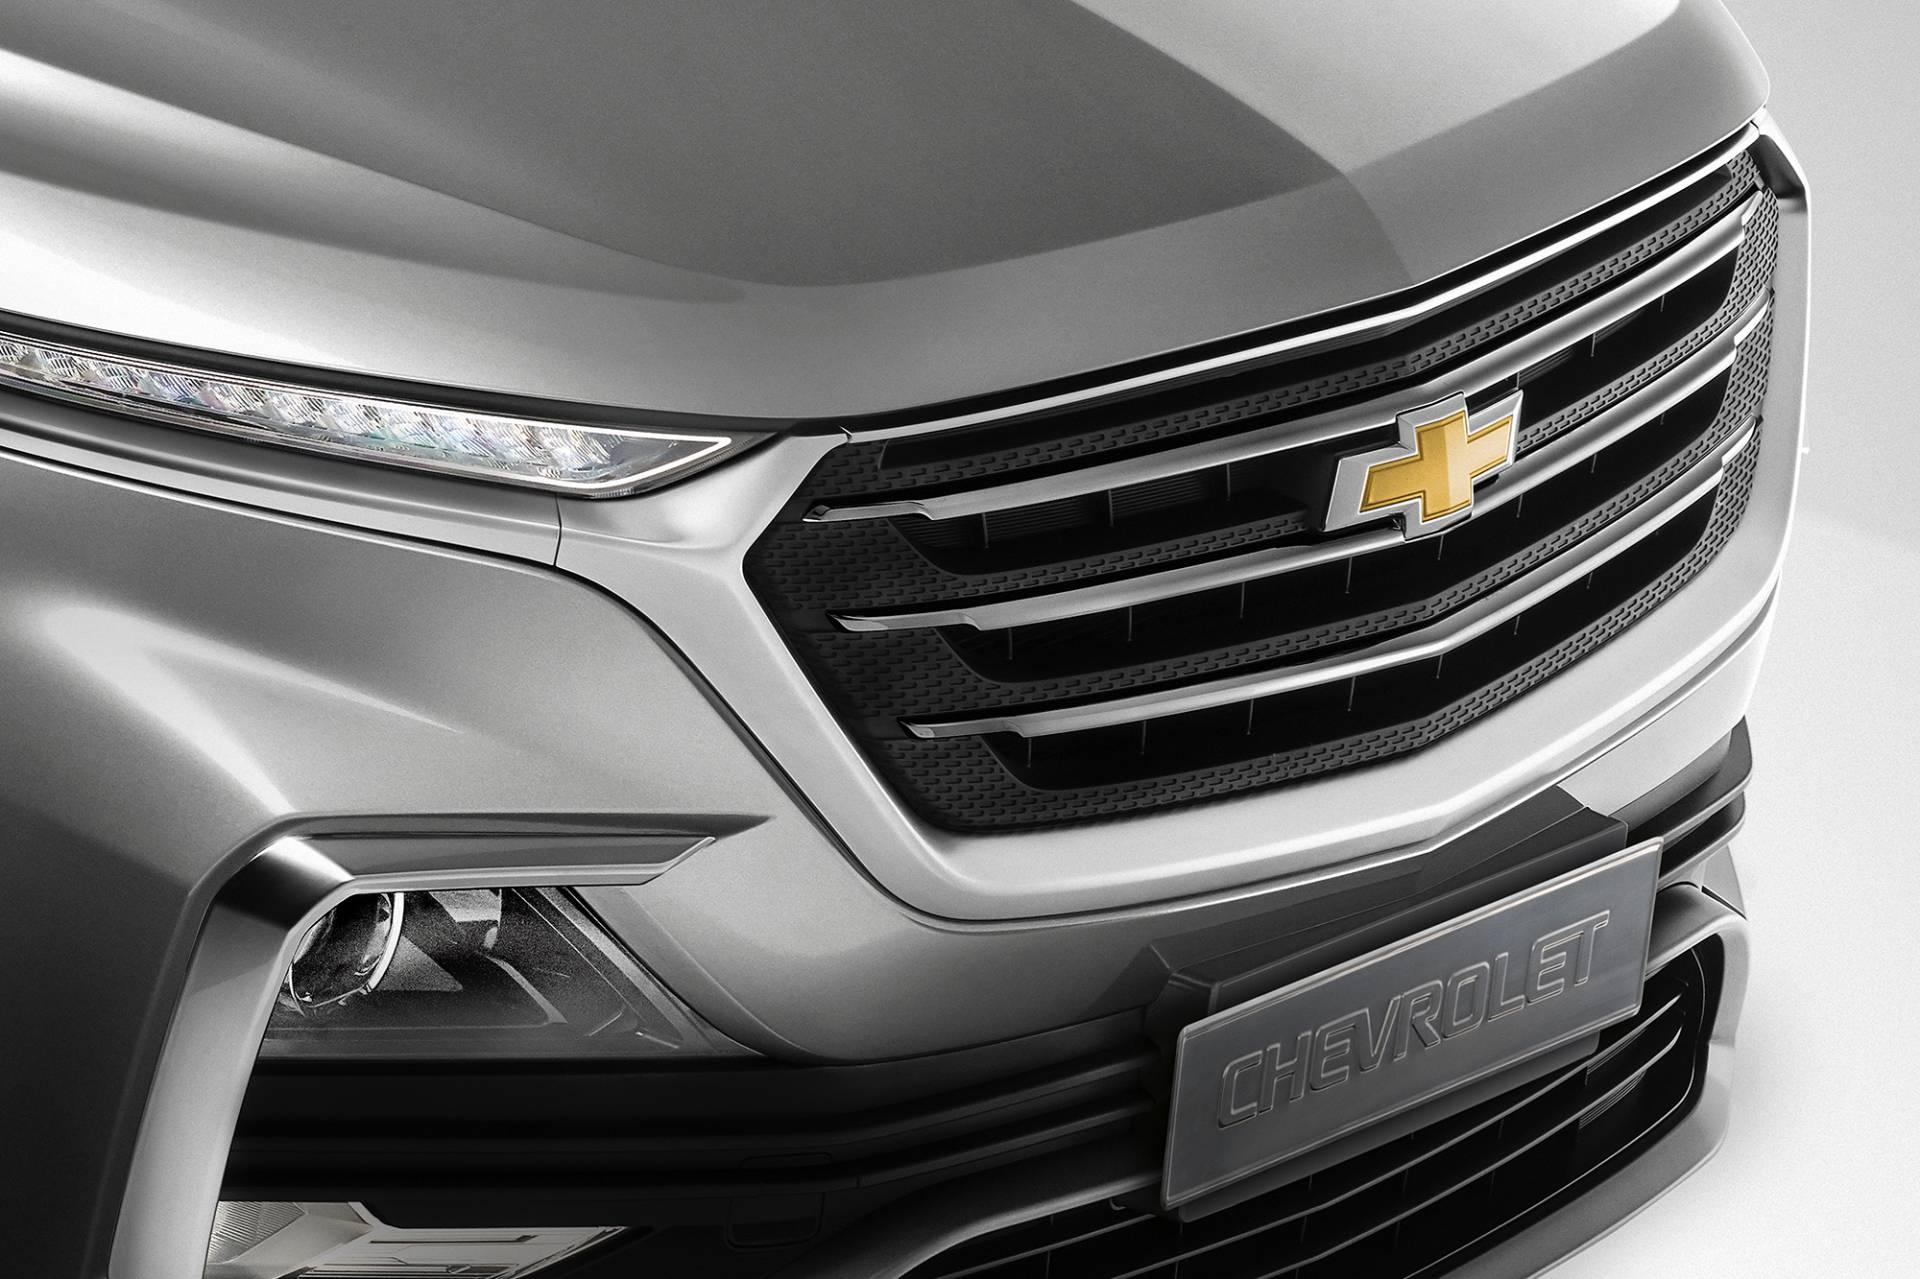 Chevrolet_Captiva_0013